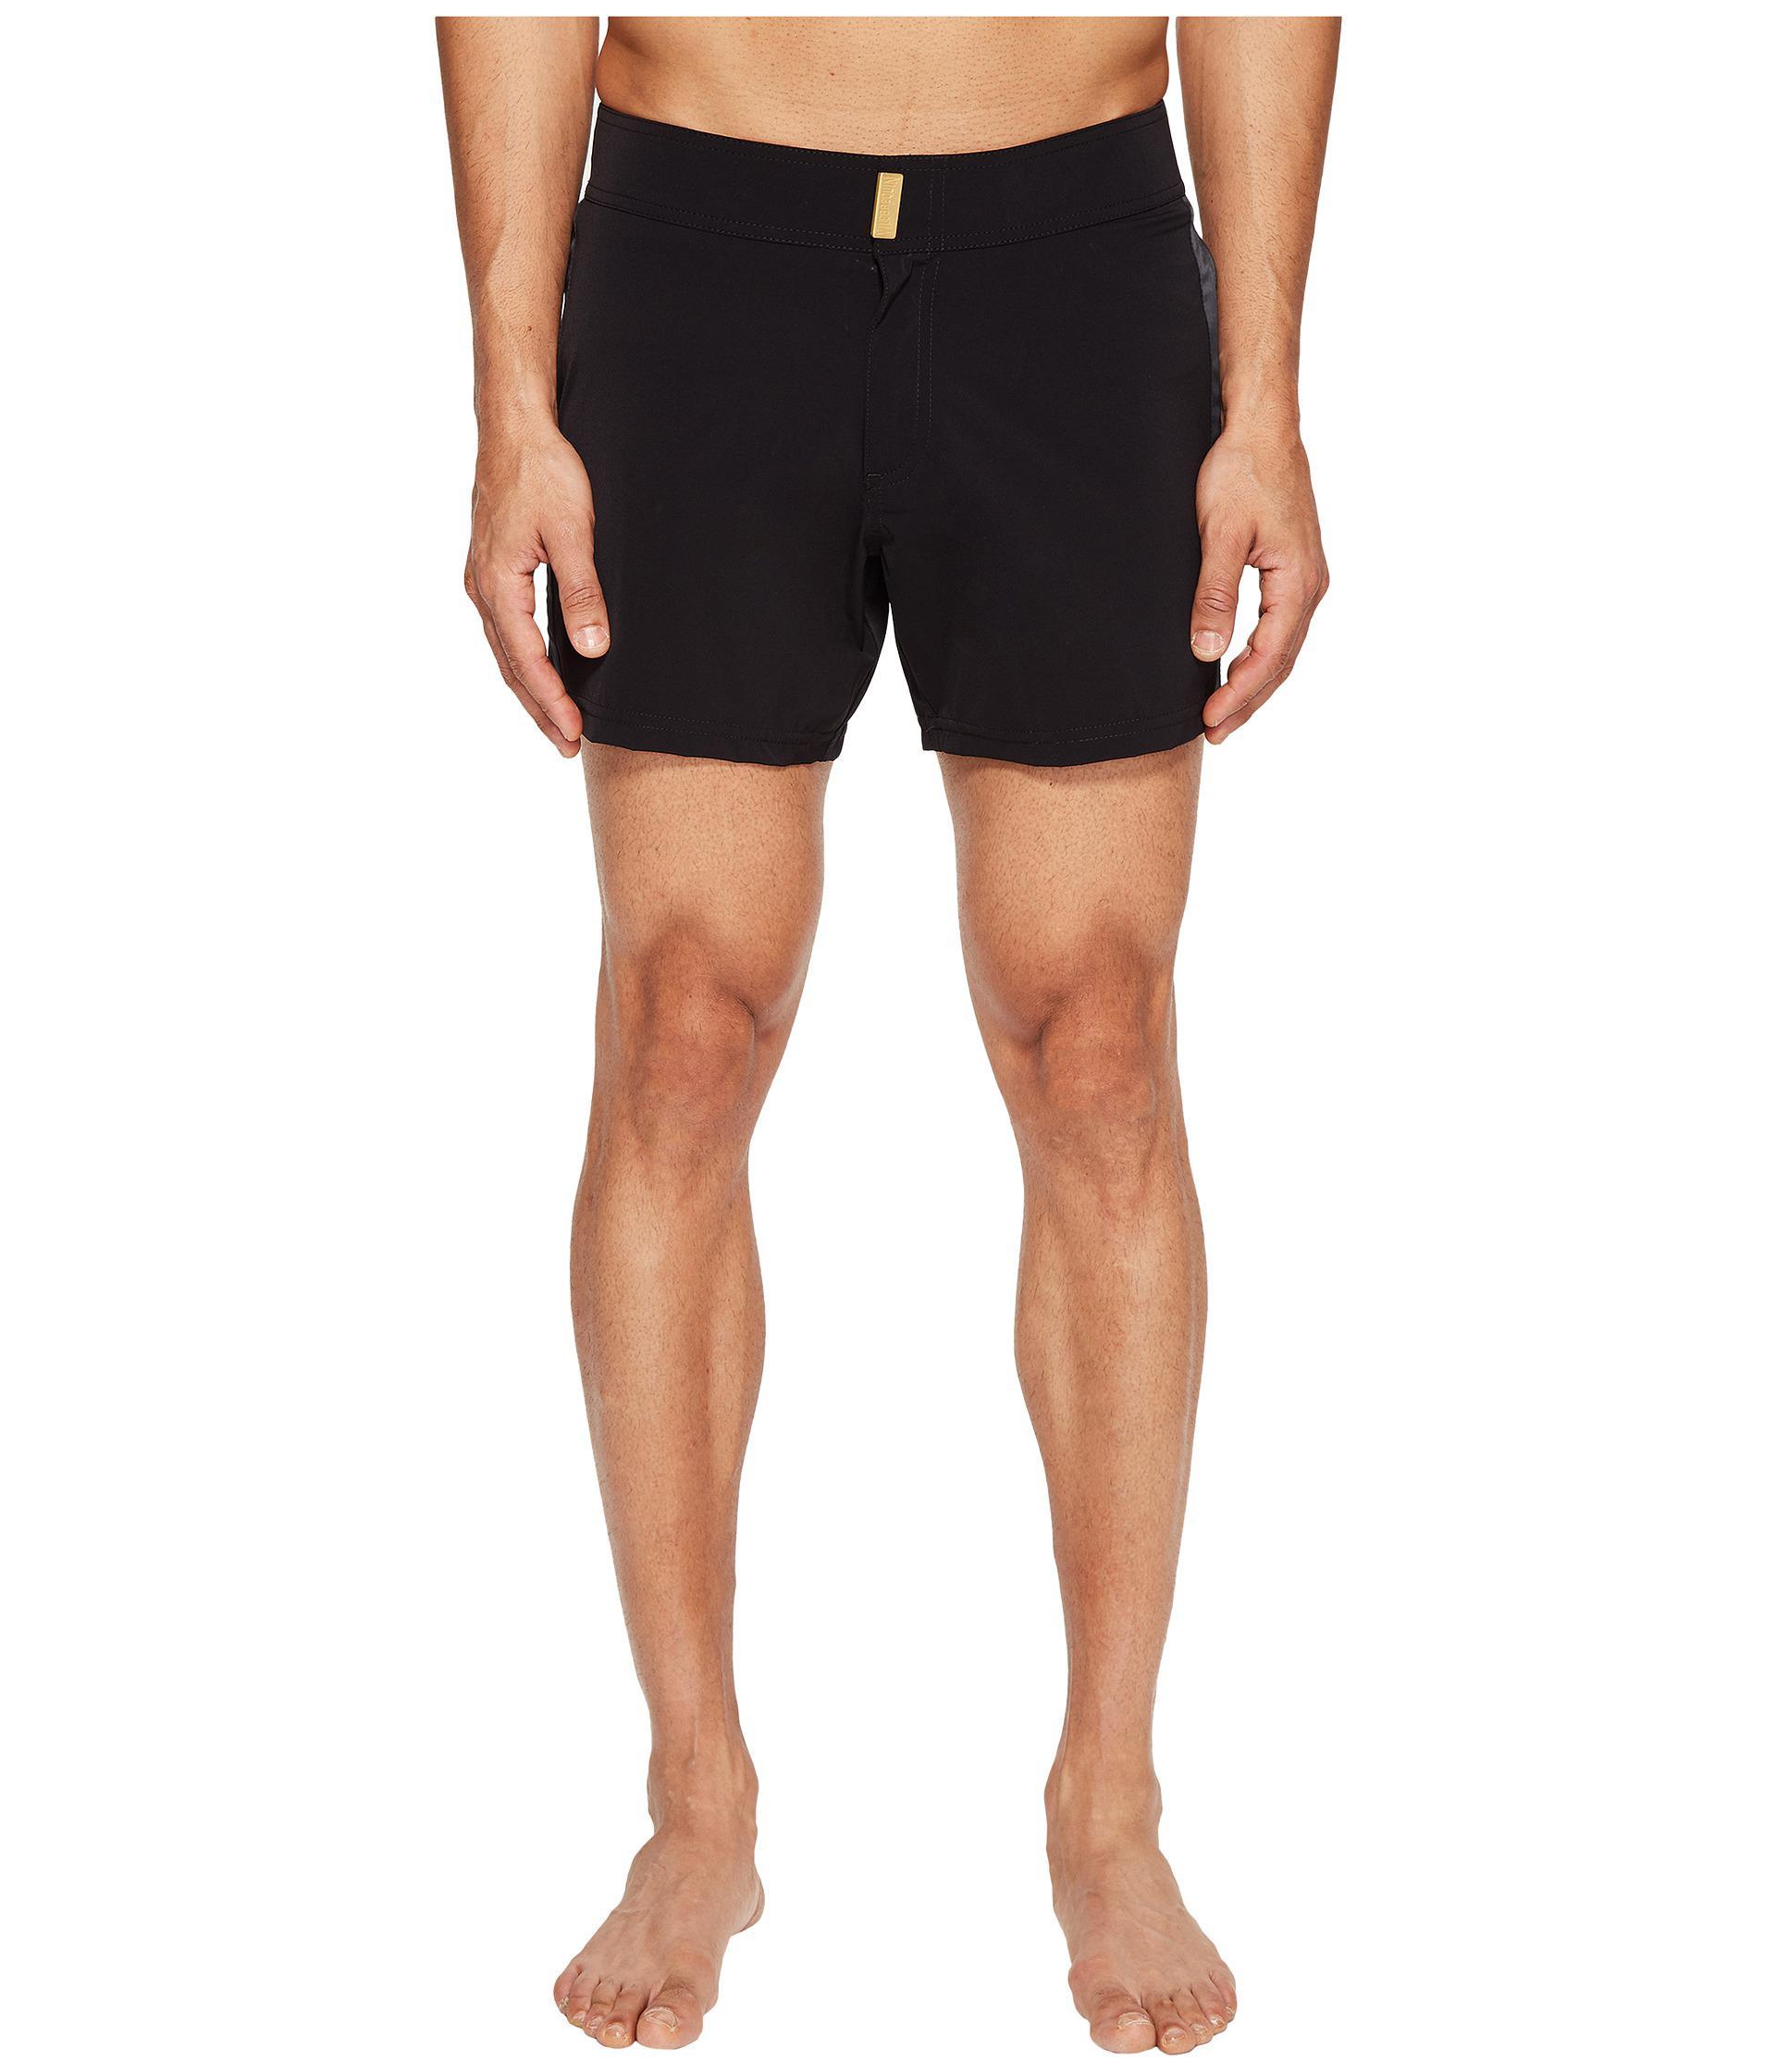 30da73da3a Vilebrequin Midnight Smoking Tuxedo Trunk (black) Men's Swimwear in ...